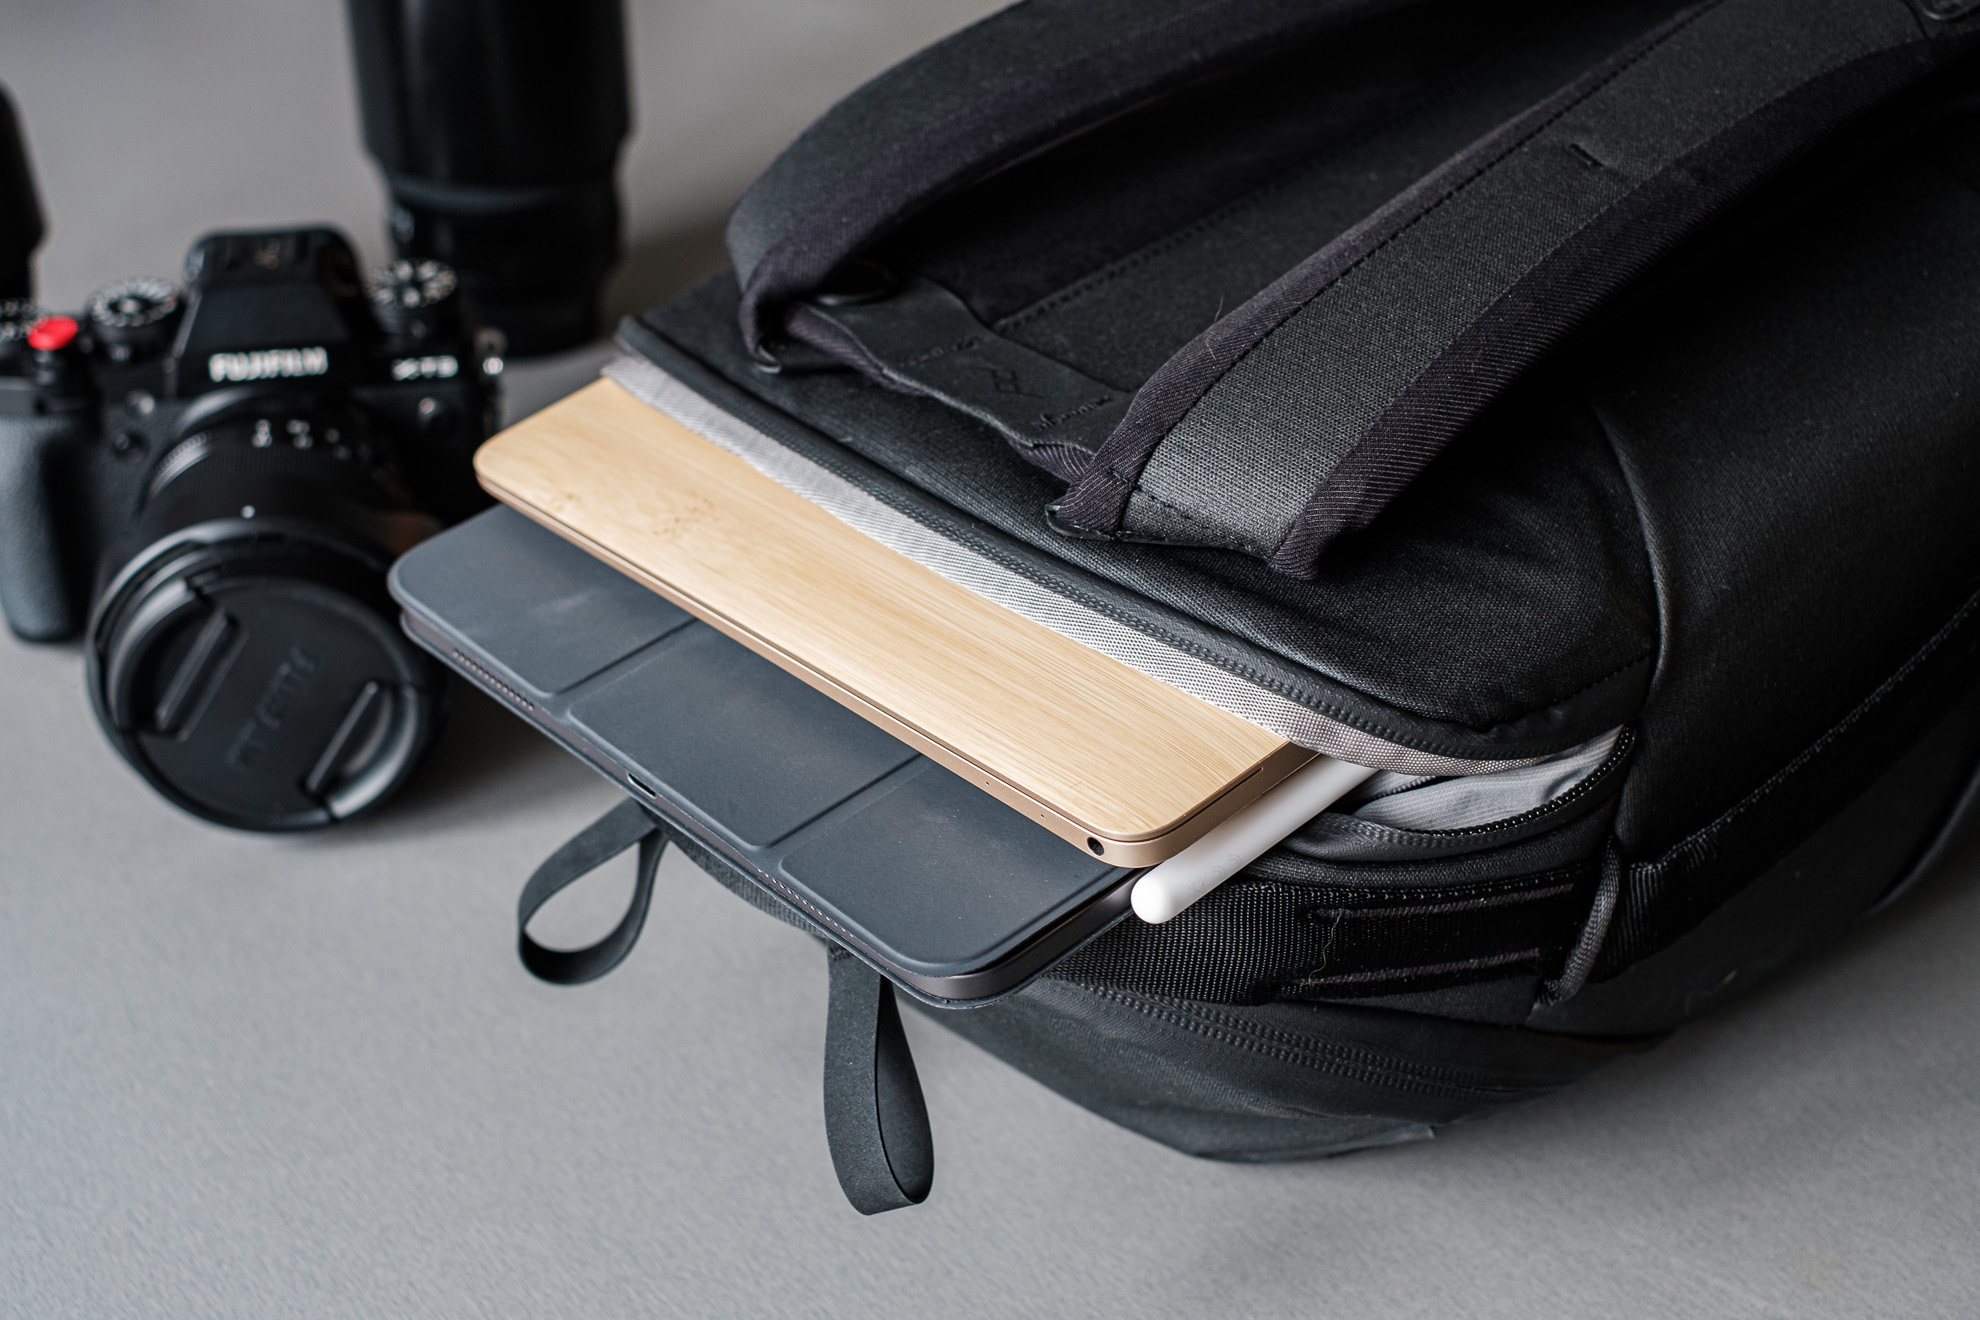 Sac à dos Peak Design Everyday Backpack Zip 15L : mon test